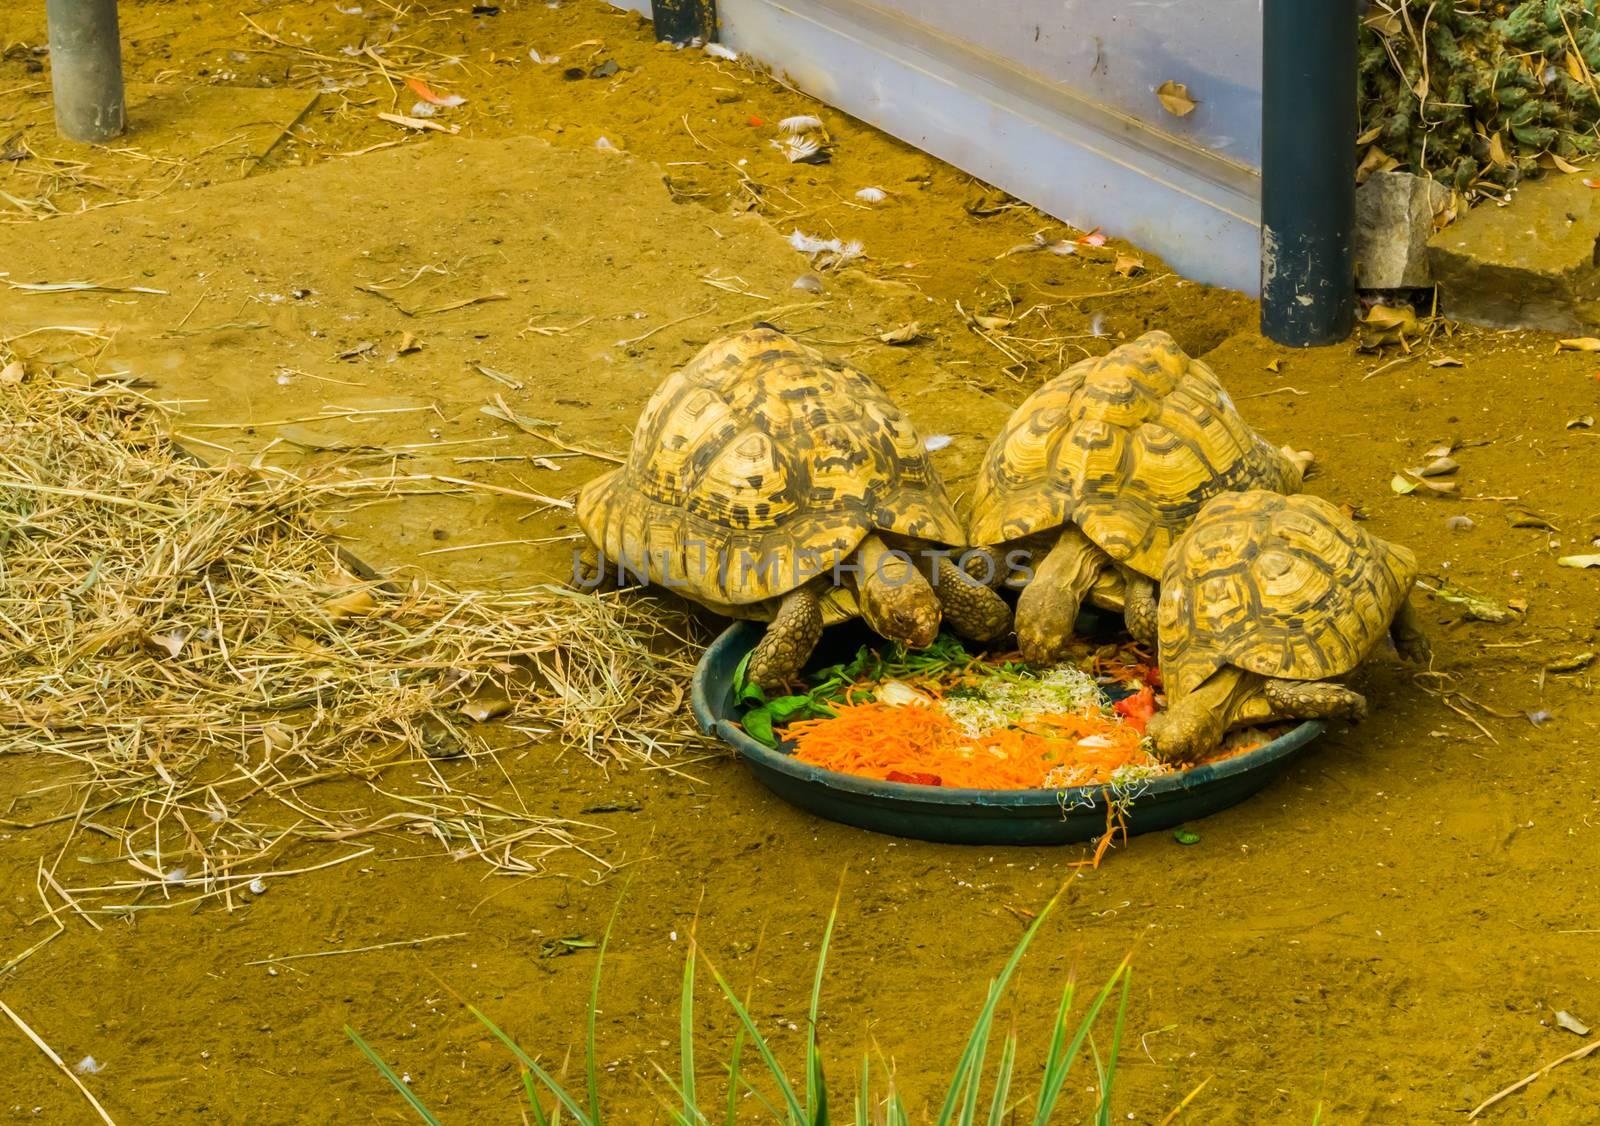 small tortoises eating vegetables, taking care of reptiles, popular tropical pets by charlottebleijenberg